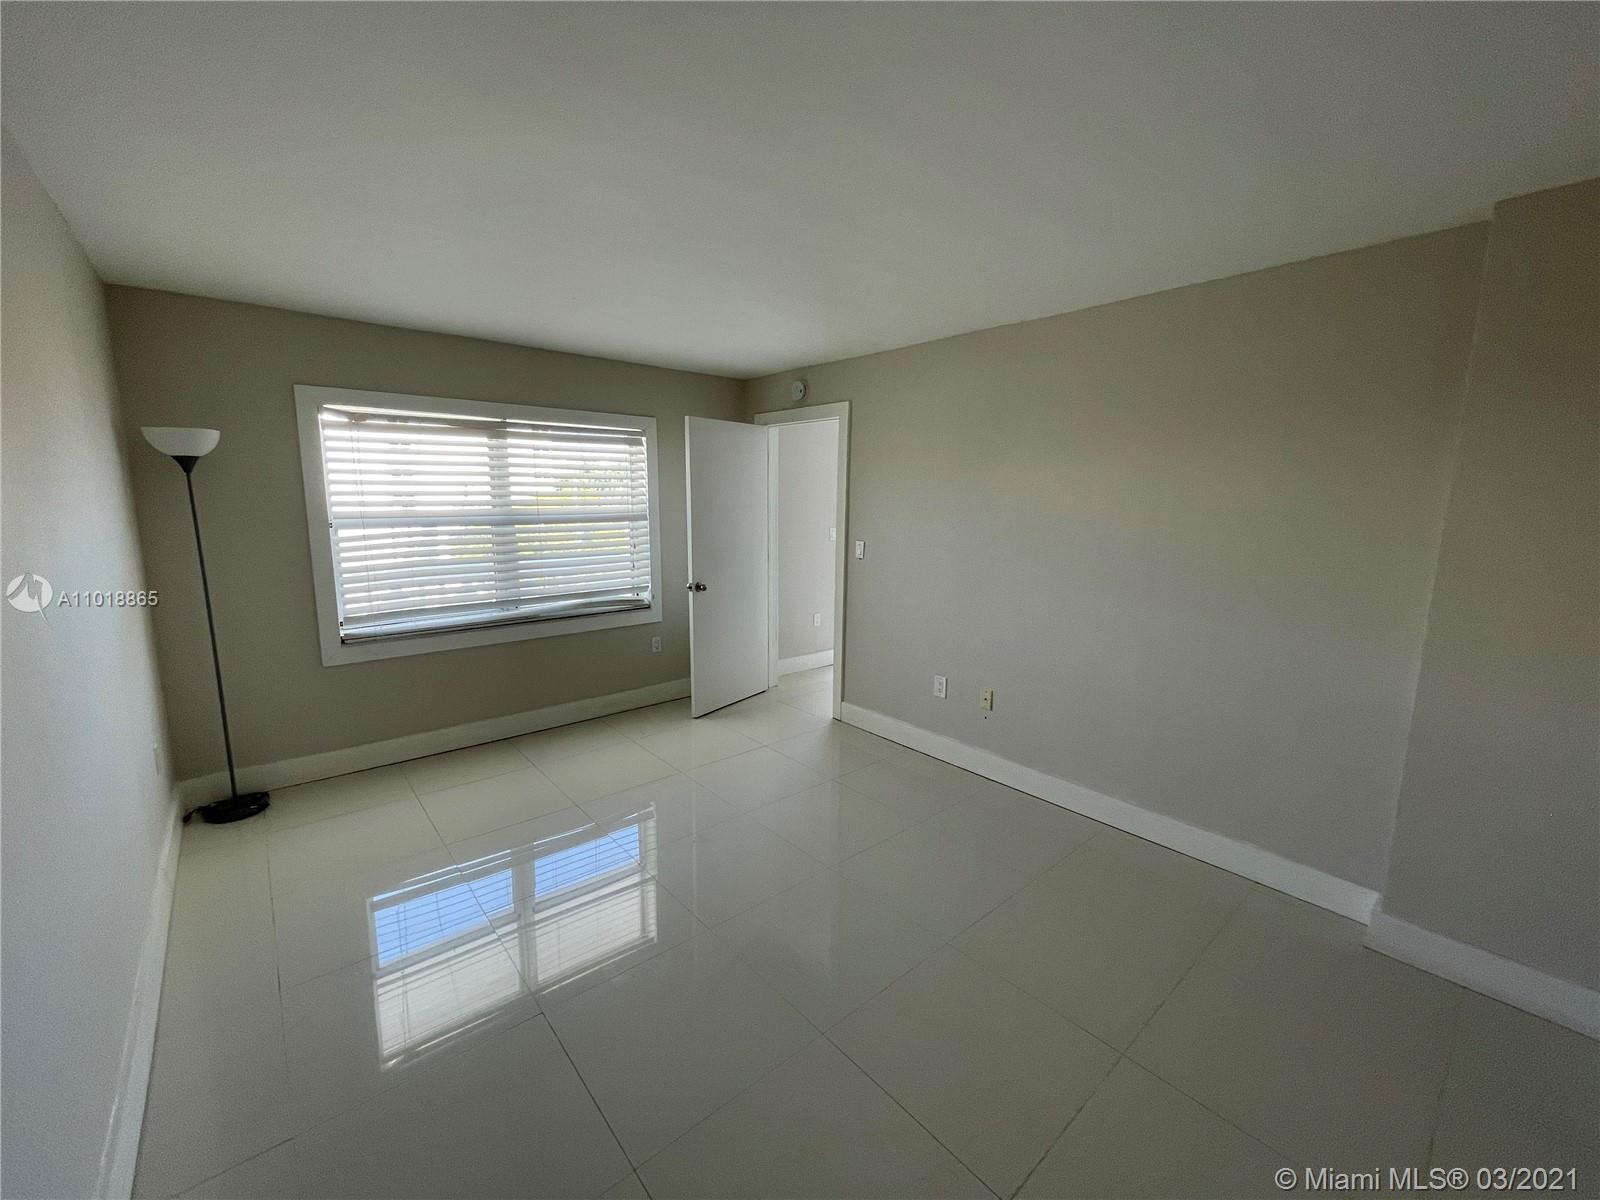 4J 1 / 2 757 sq. ft. $ 2021-03-26 0 Photo